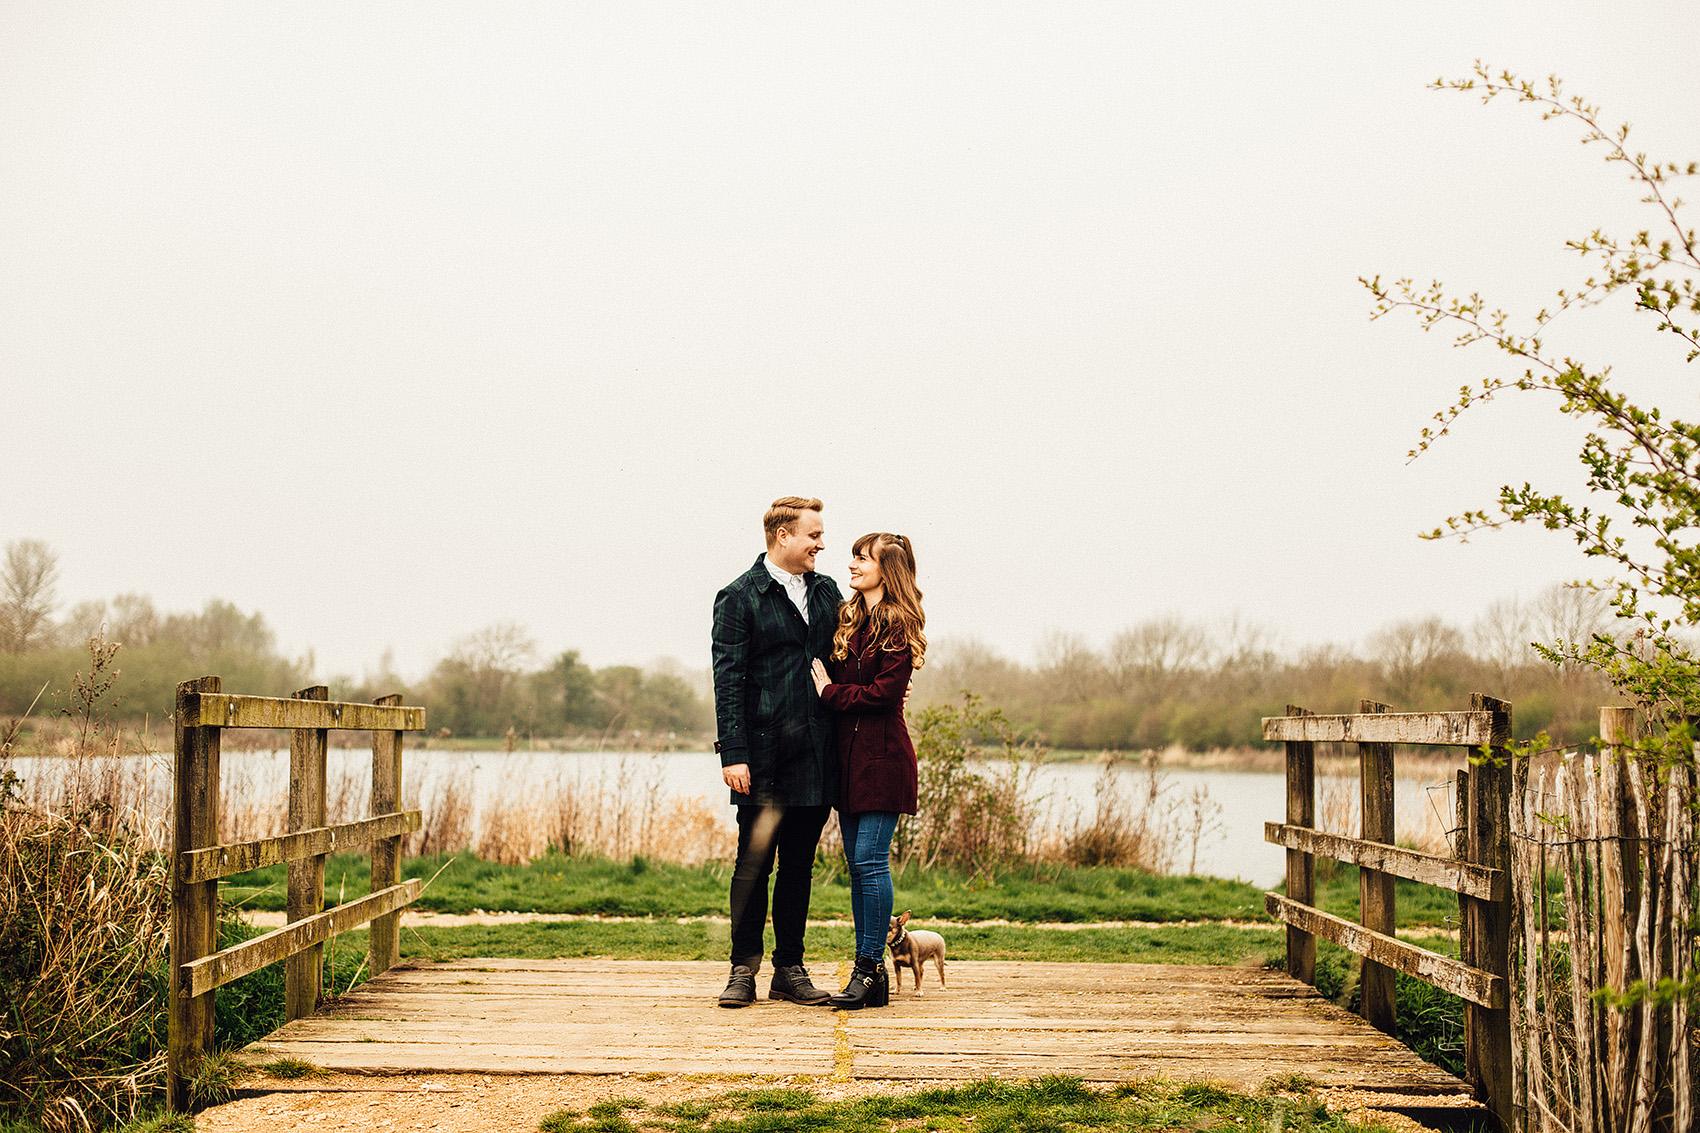 Ryan and Shannon-11-54-03 Website.jpg